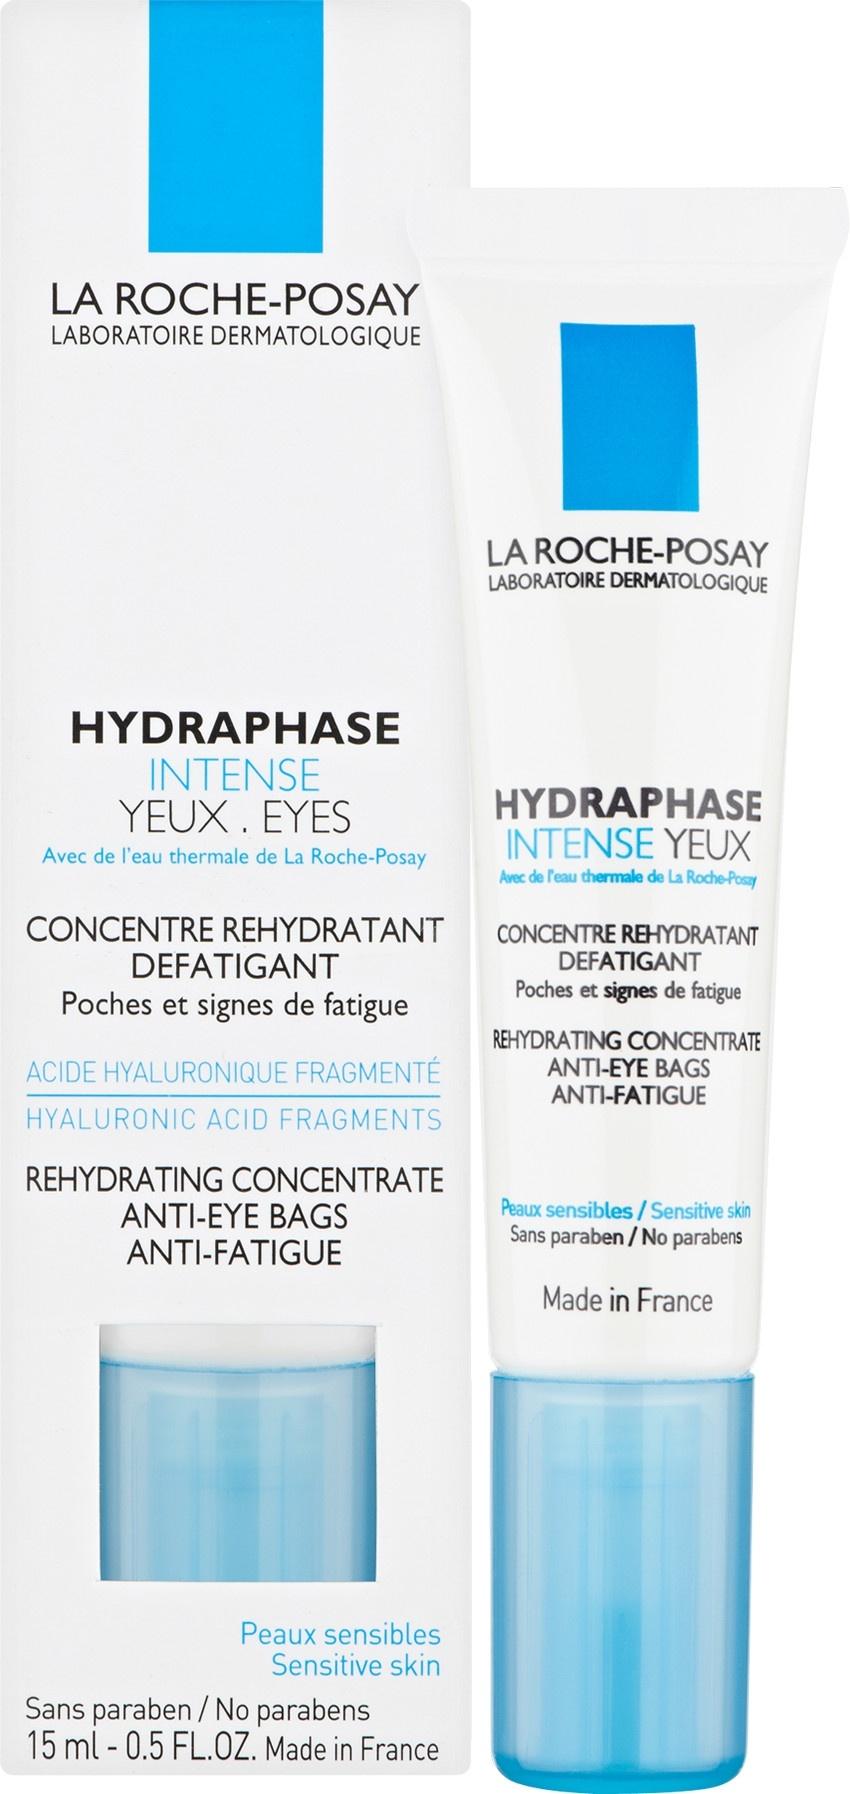 La Roche-Posay Hydraphase Intense Eyes - Targeted Rehydration 15ml